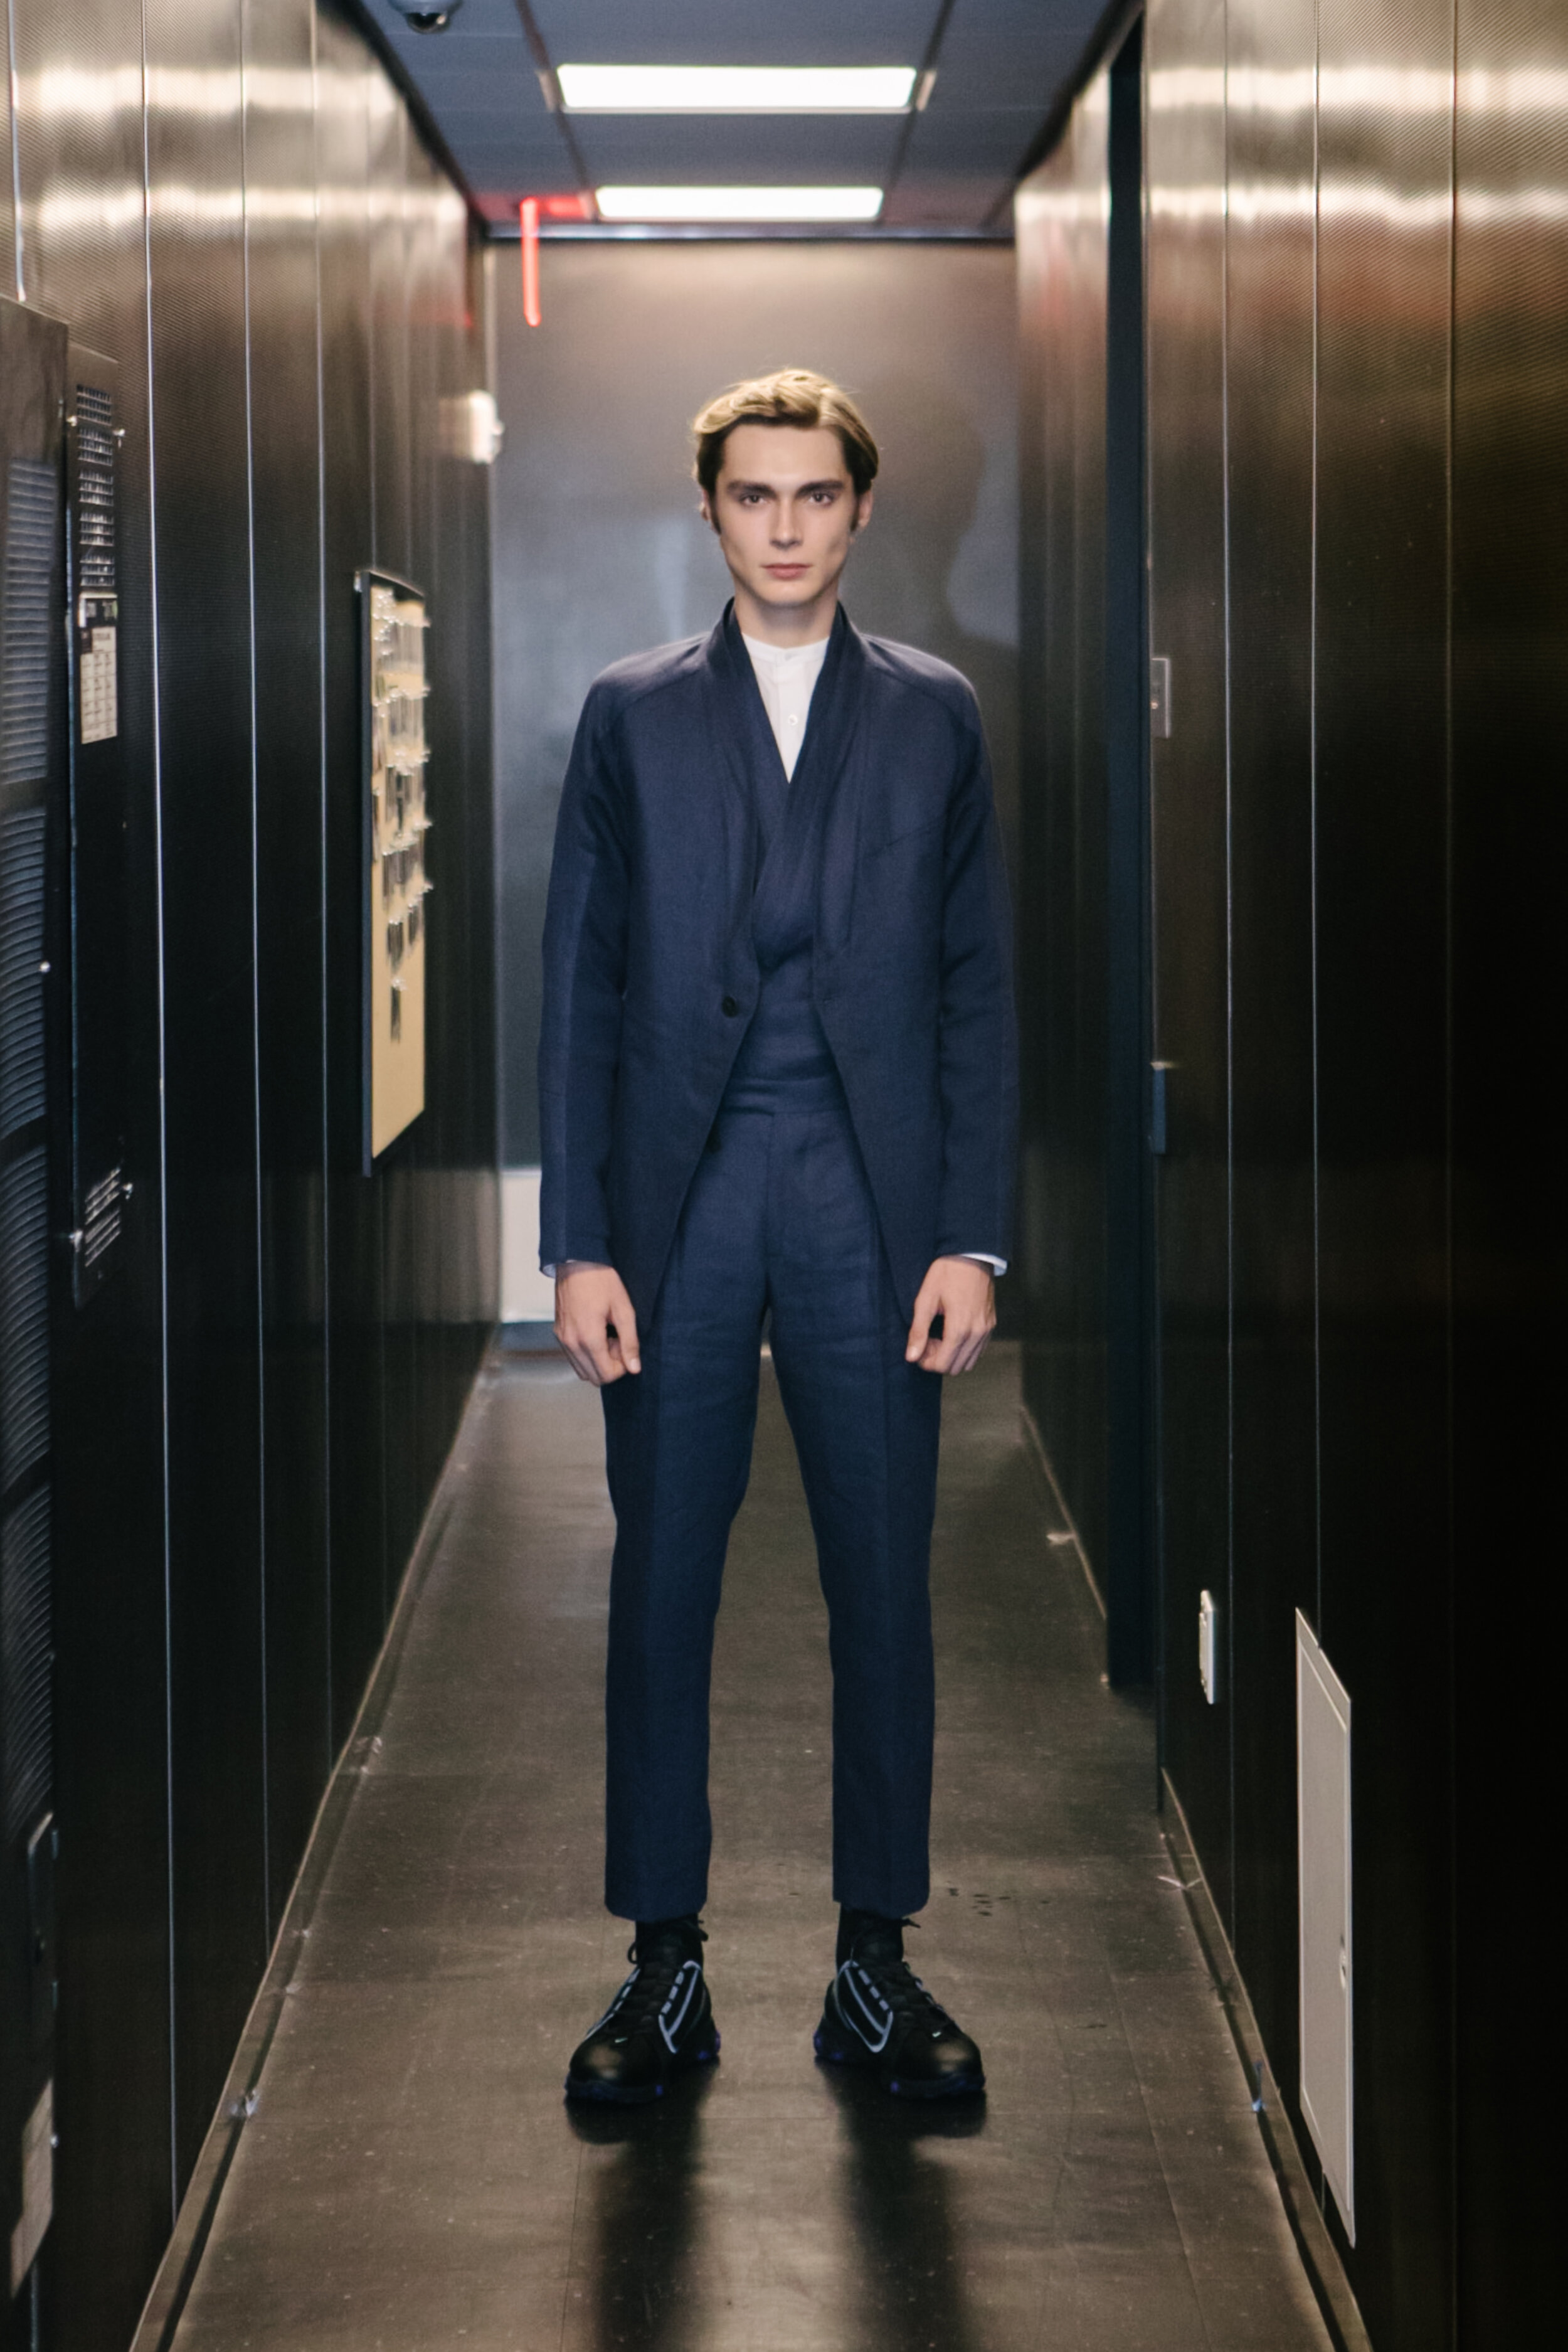 ARC Suit, 3-Piece, 2020   ARC Jacket, ARC Kimono Shirt, ARC Trouser    Available To Order Upon Request →